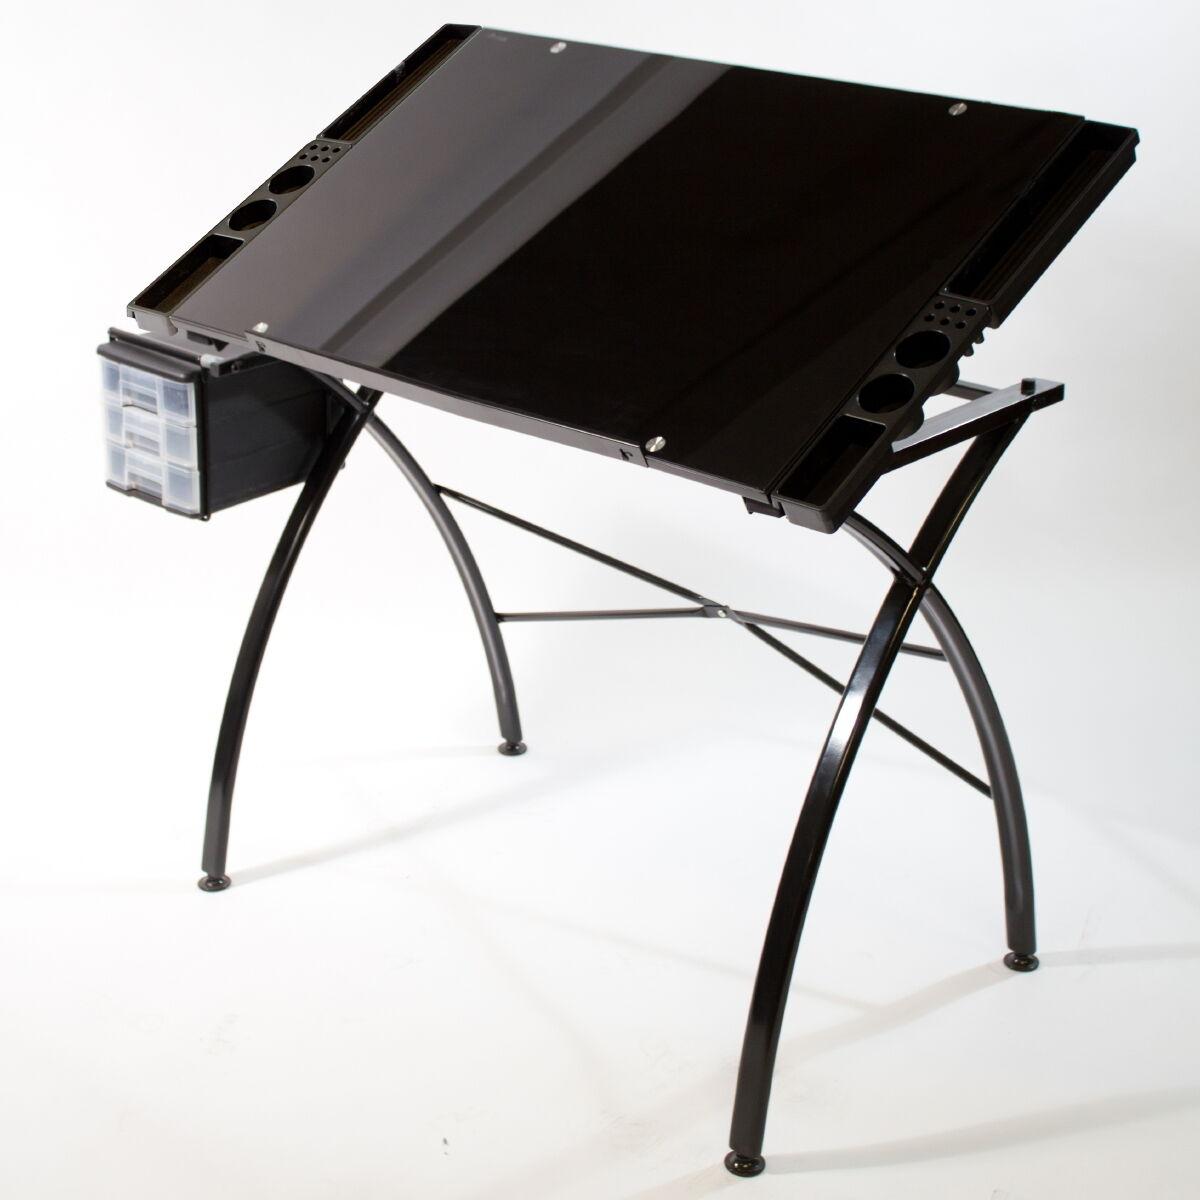 Hobby Line Glas Design New Art : Glass drawing art drafting table desk hobby craft